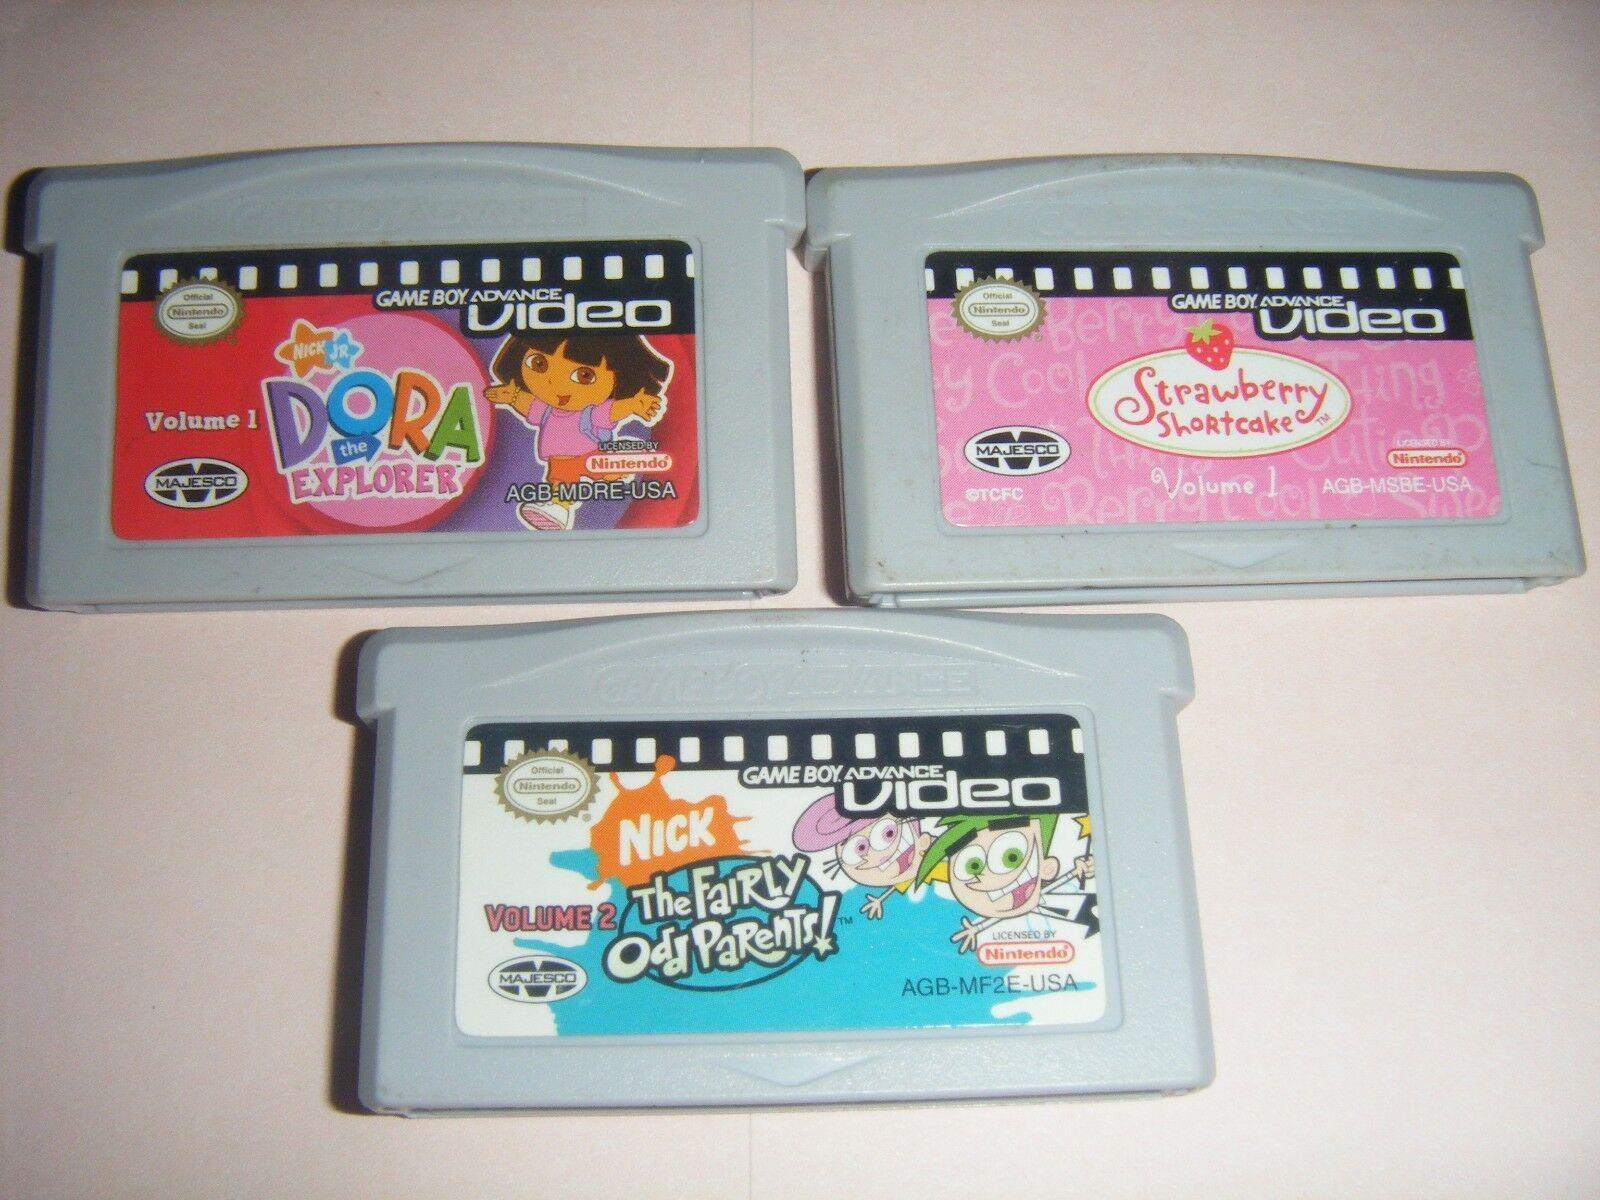 3 GBA Video STRAWBERRY SHORTCAKE Dora Explorer Nintendo Game Boy Advance DS Lite